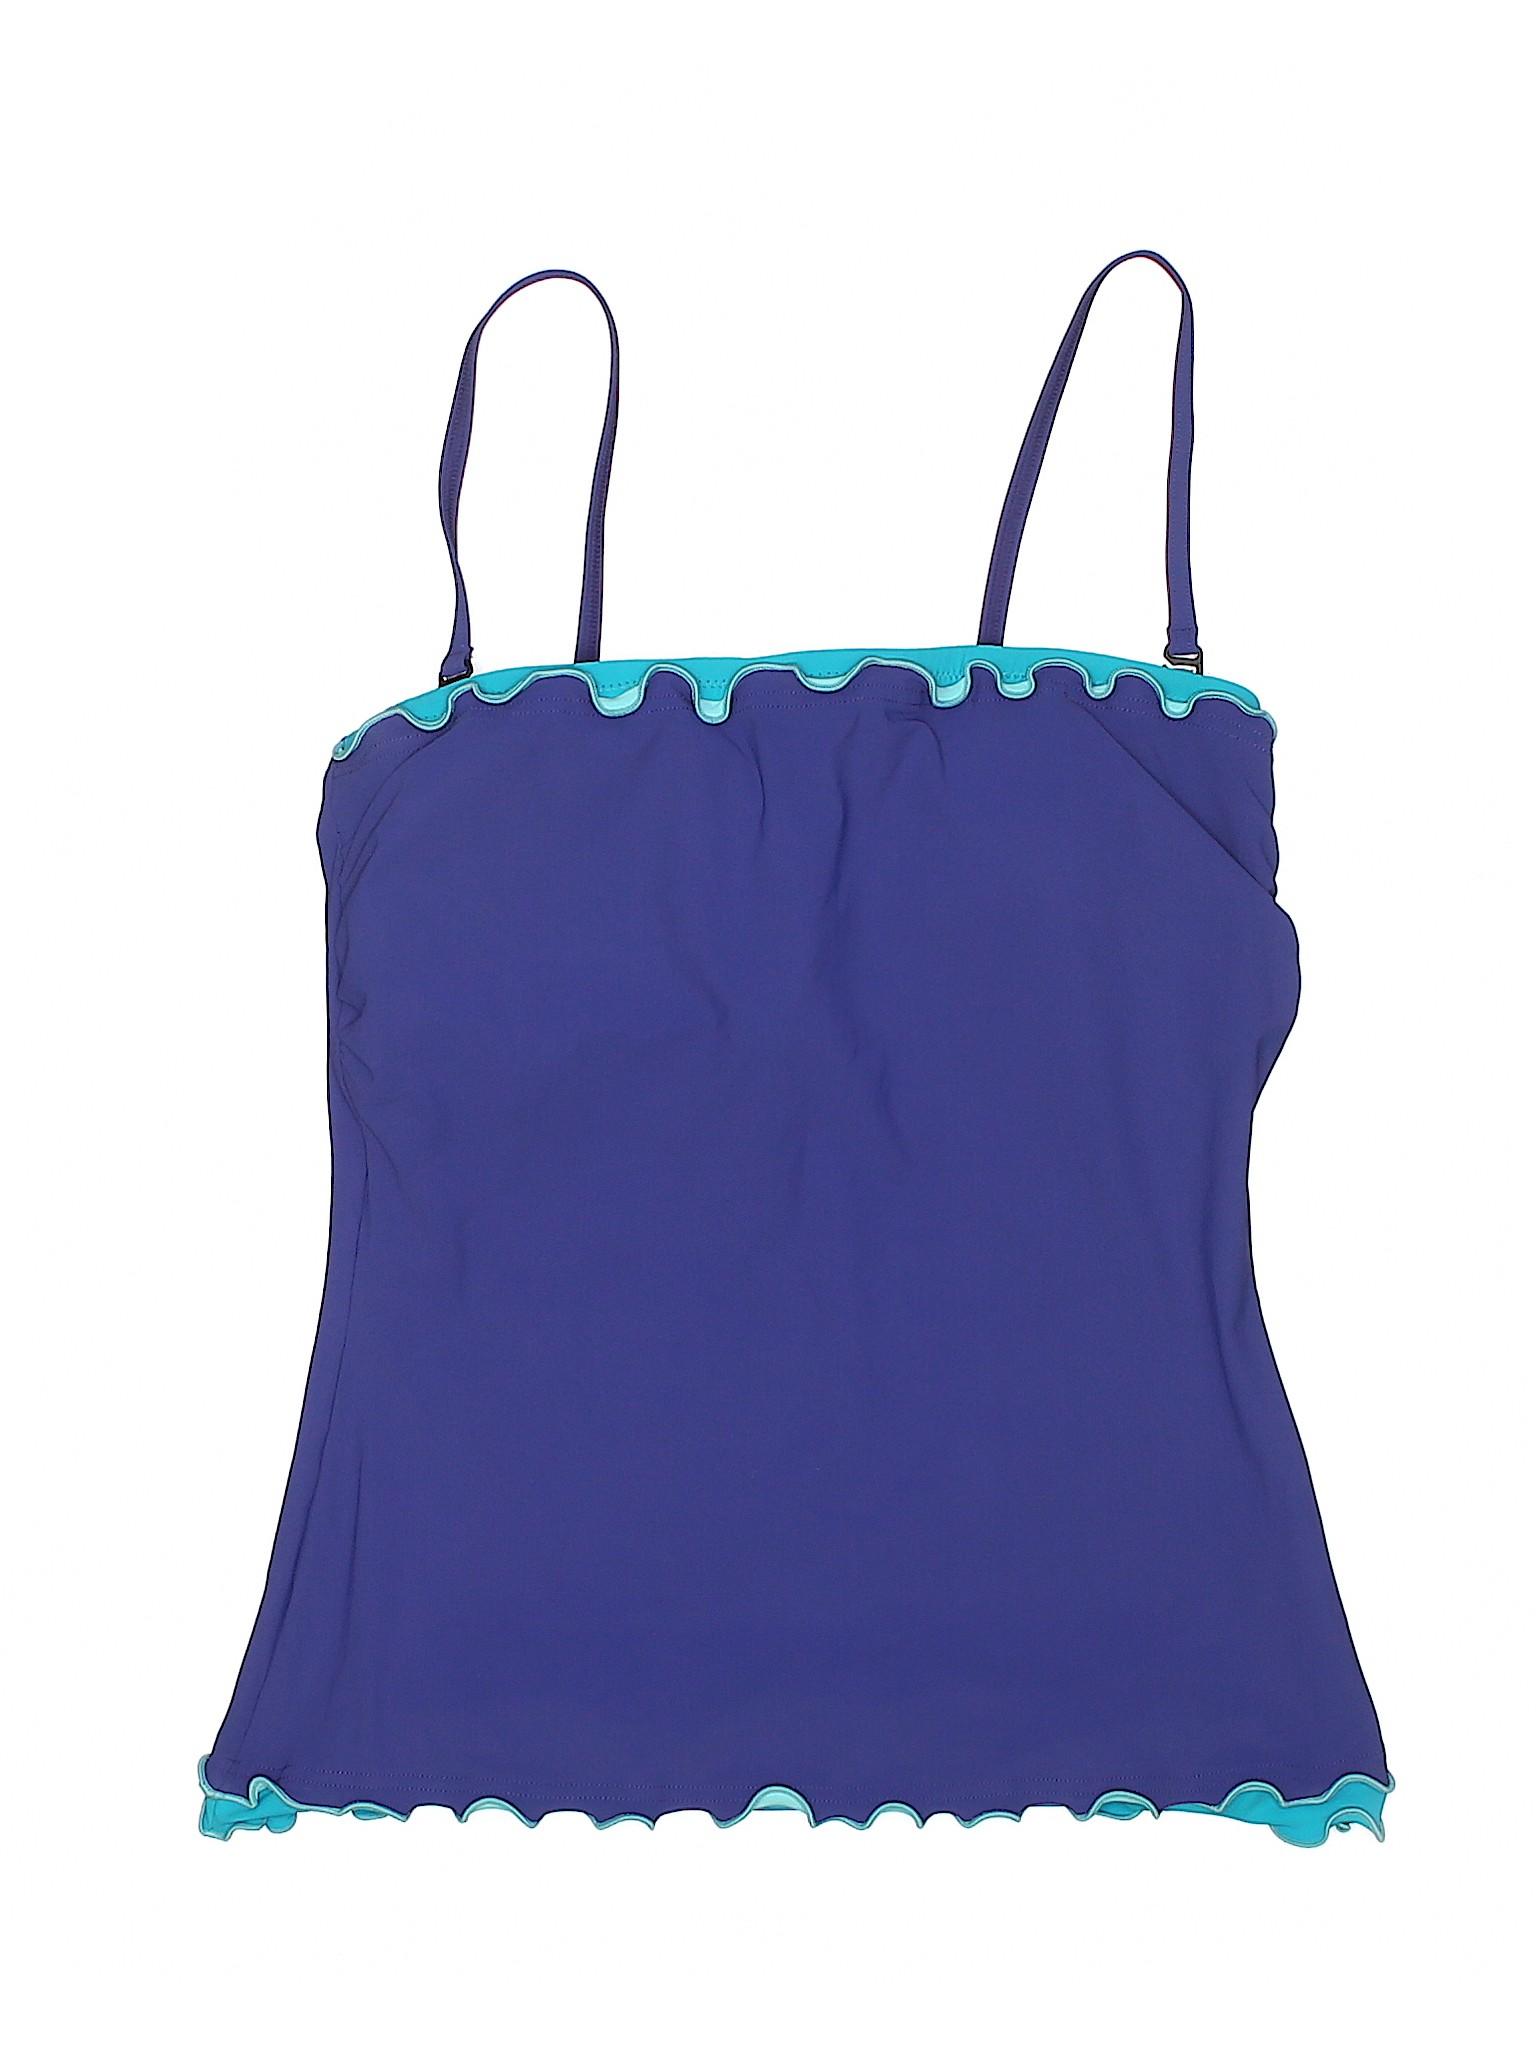 Swimsuit Profile Swimsuit Top Boutique Swimsuit Profile Boutique Swimsuit Profile Profile Boutique Top Boutique Top qRdwEaq